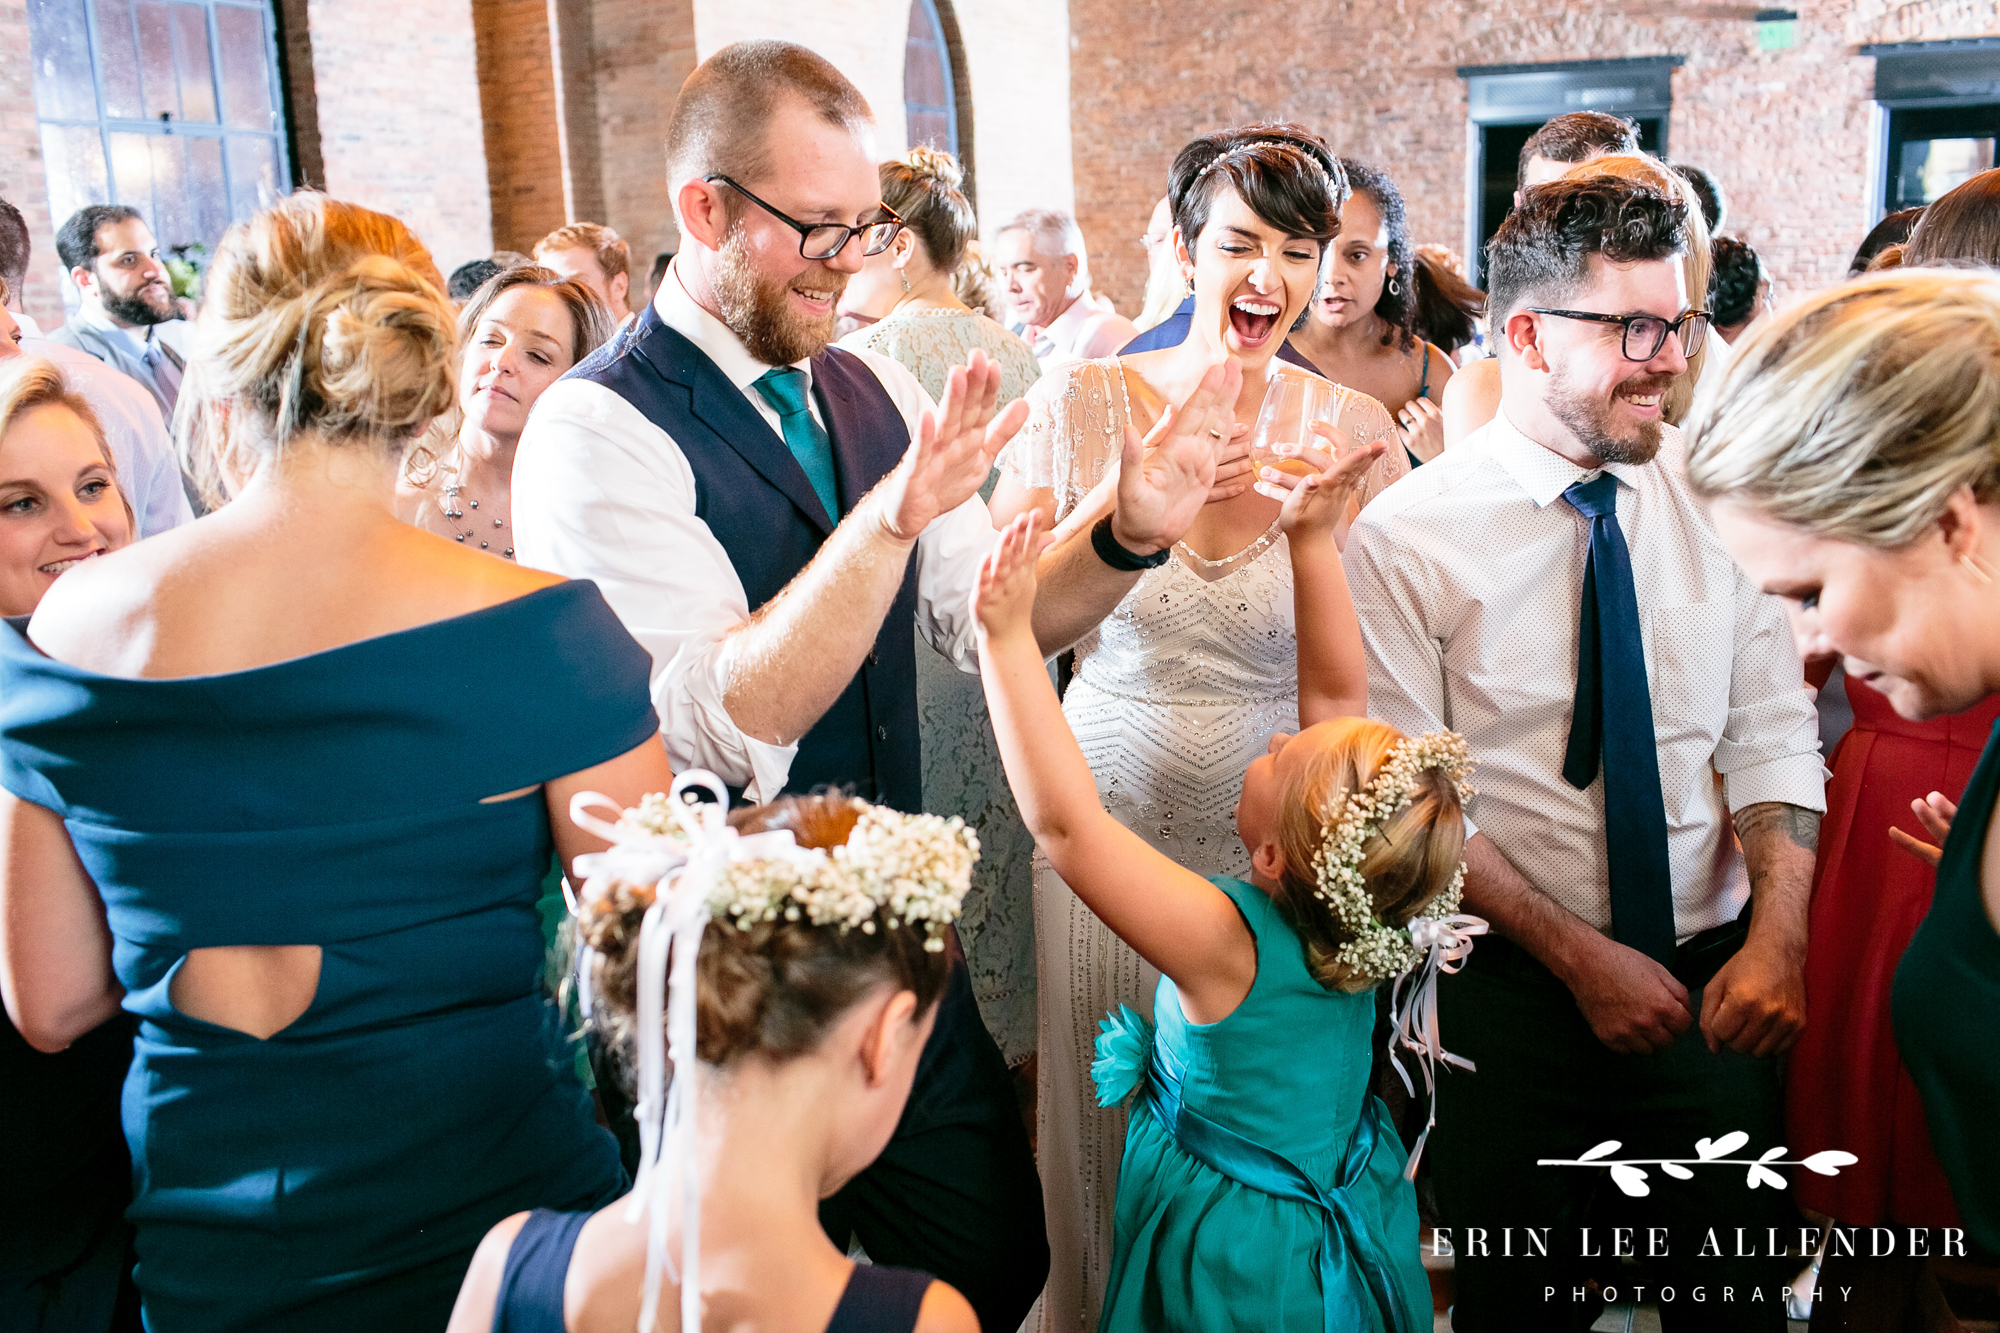 bride-groom-dance-with-flower-girls